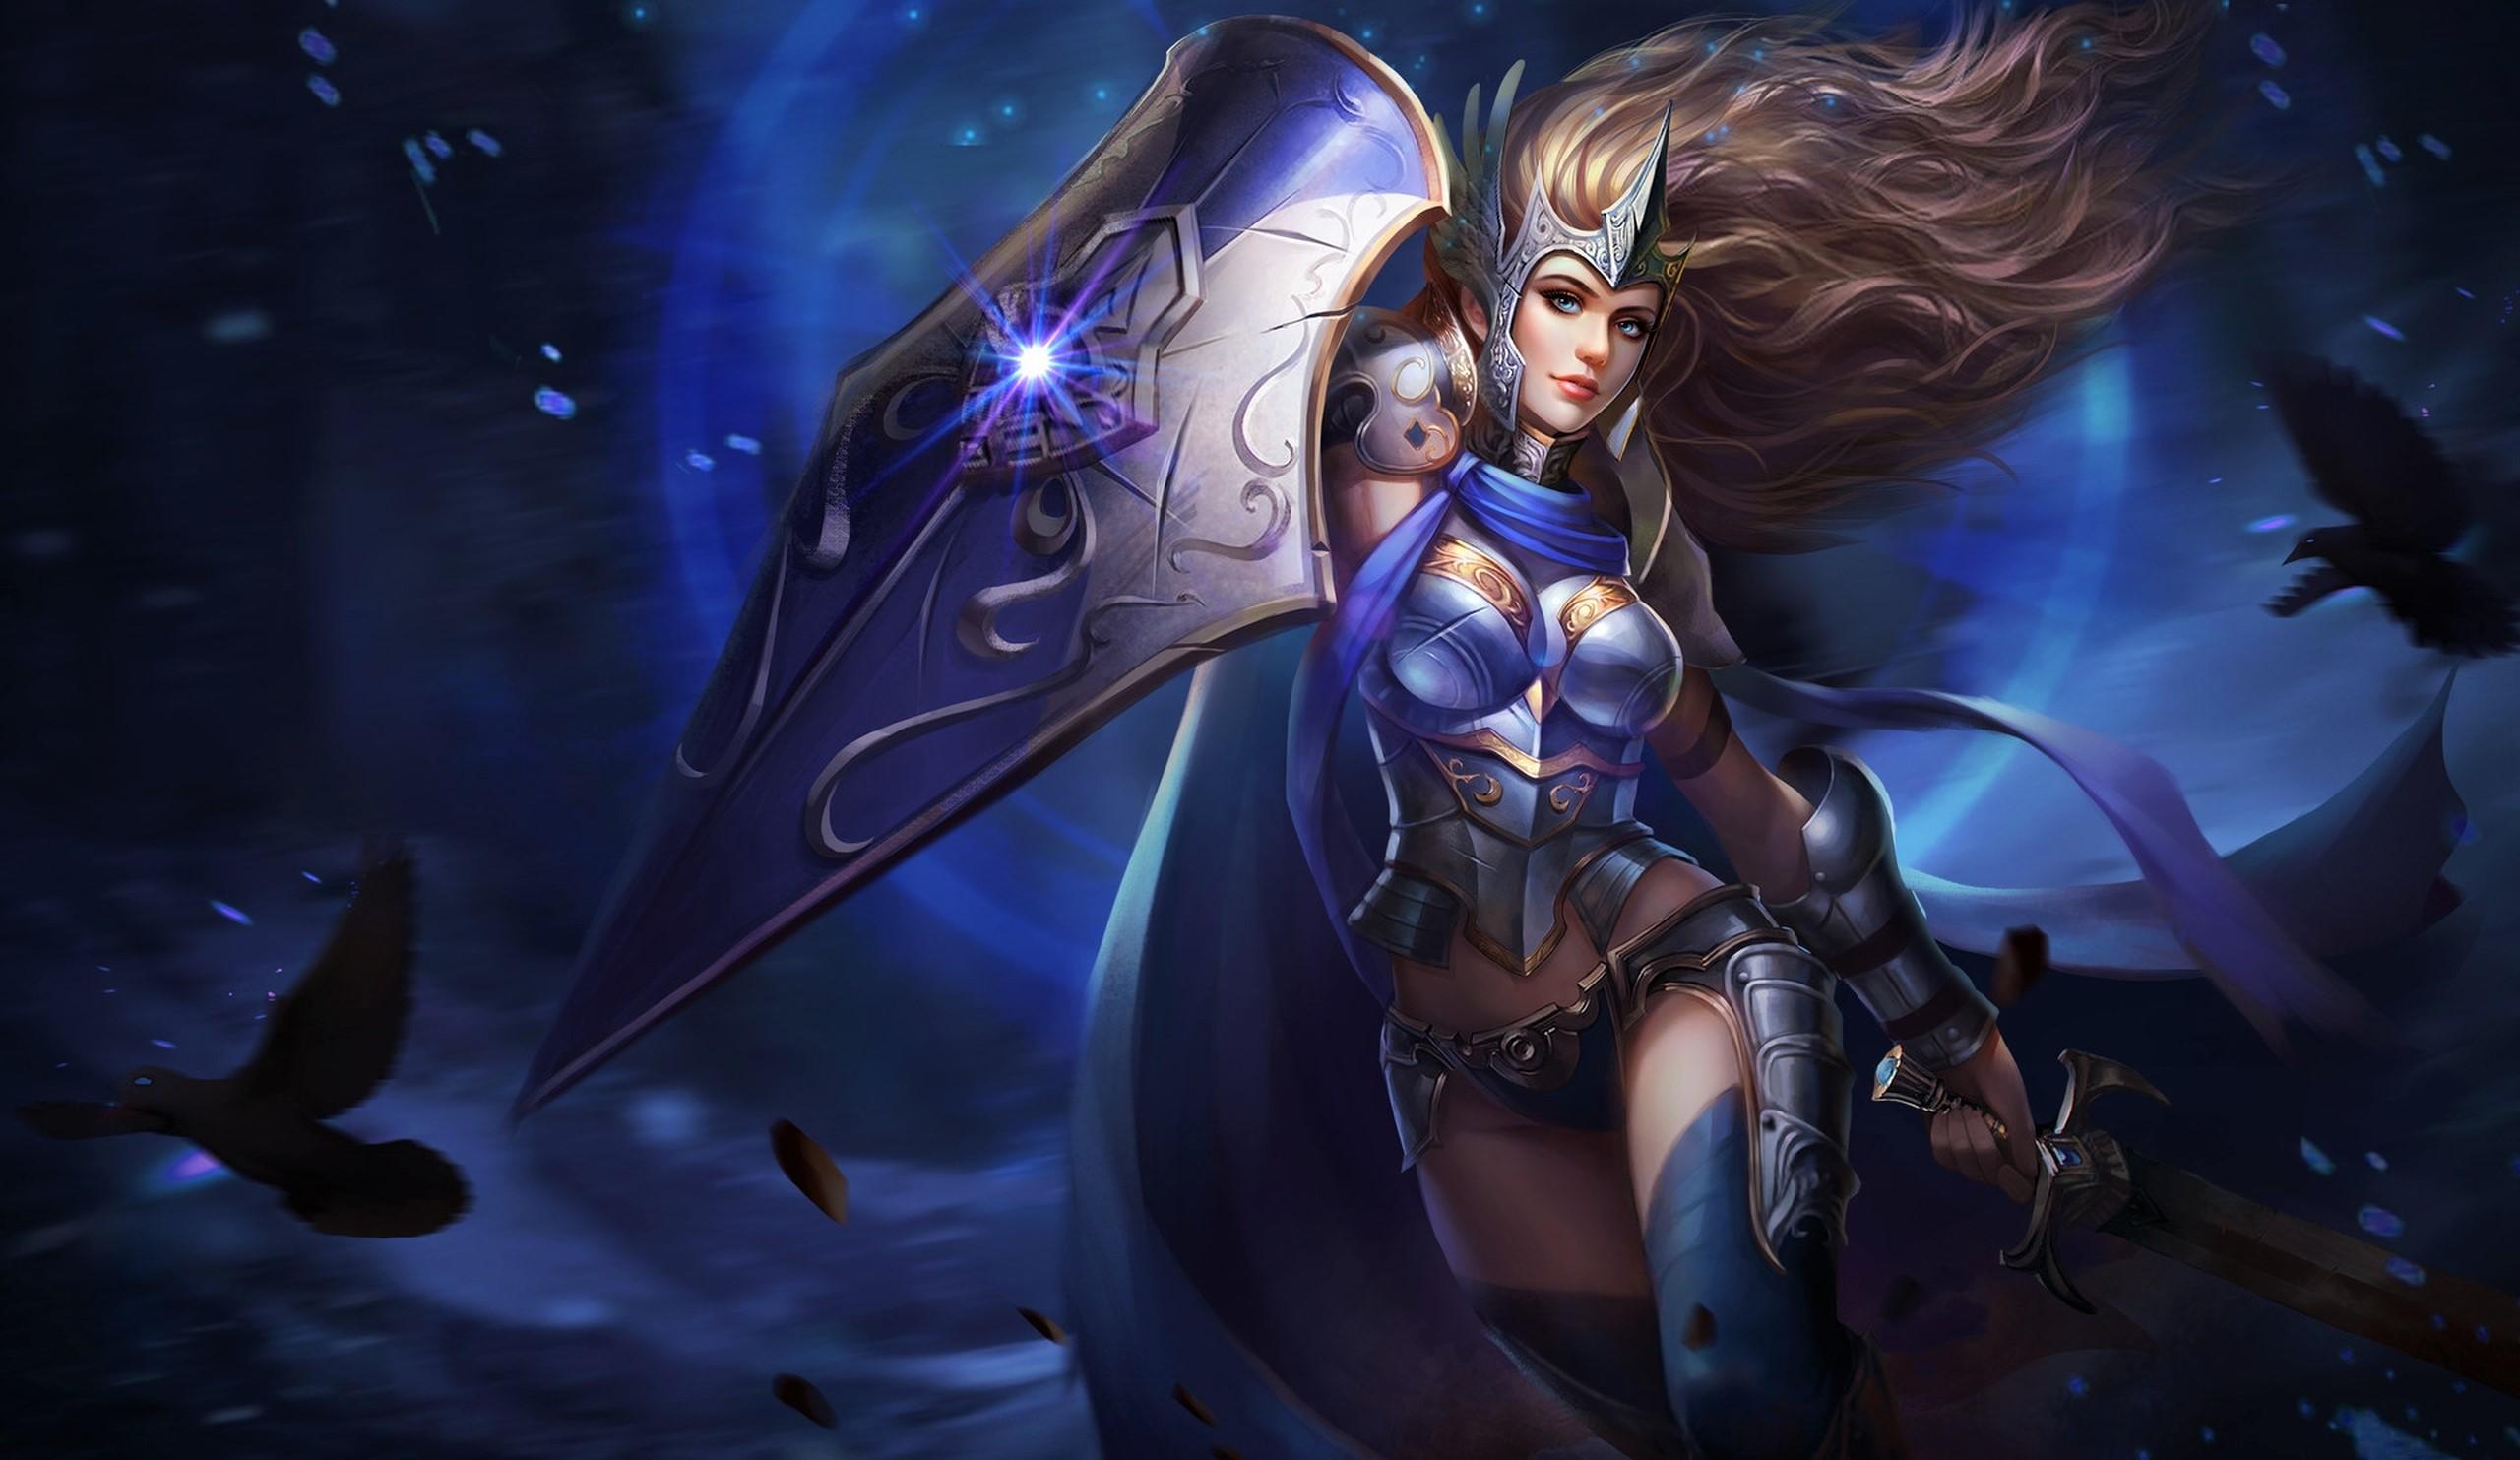 Girl Raven Shield Sword Woman Woman Warrior 2560x1483